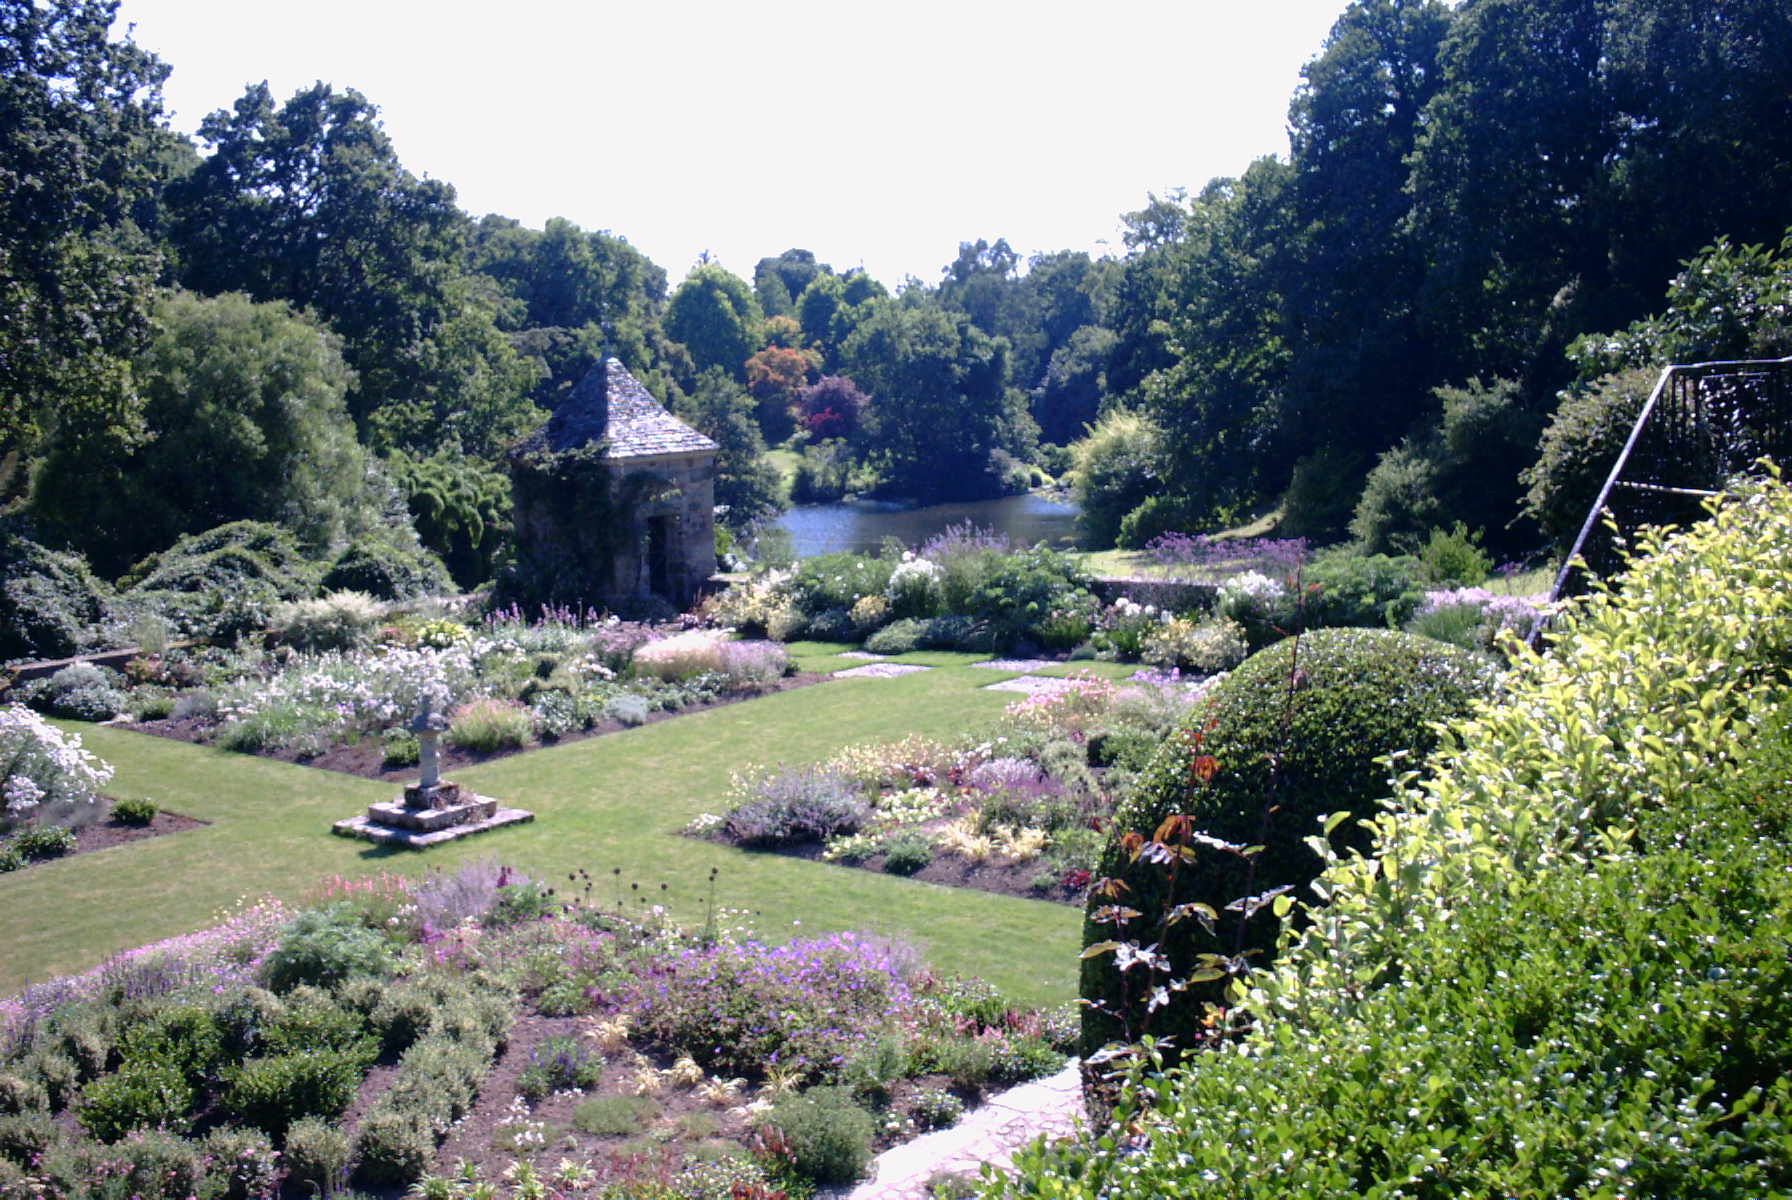 Le jardin de kerdalo for Jardin remarquable